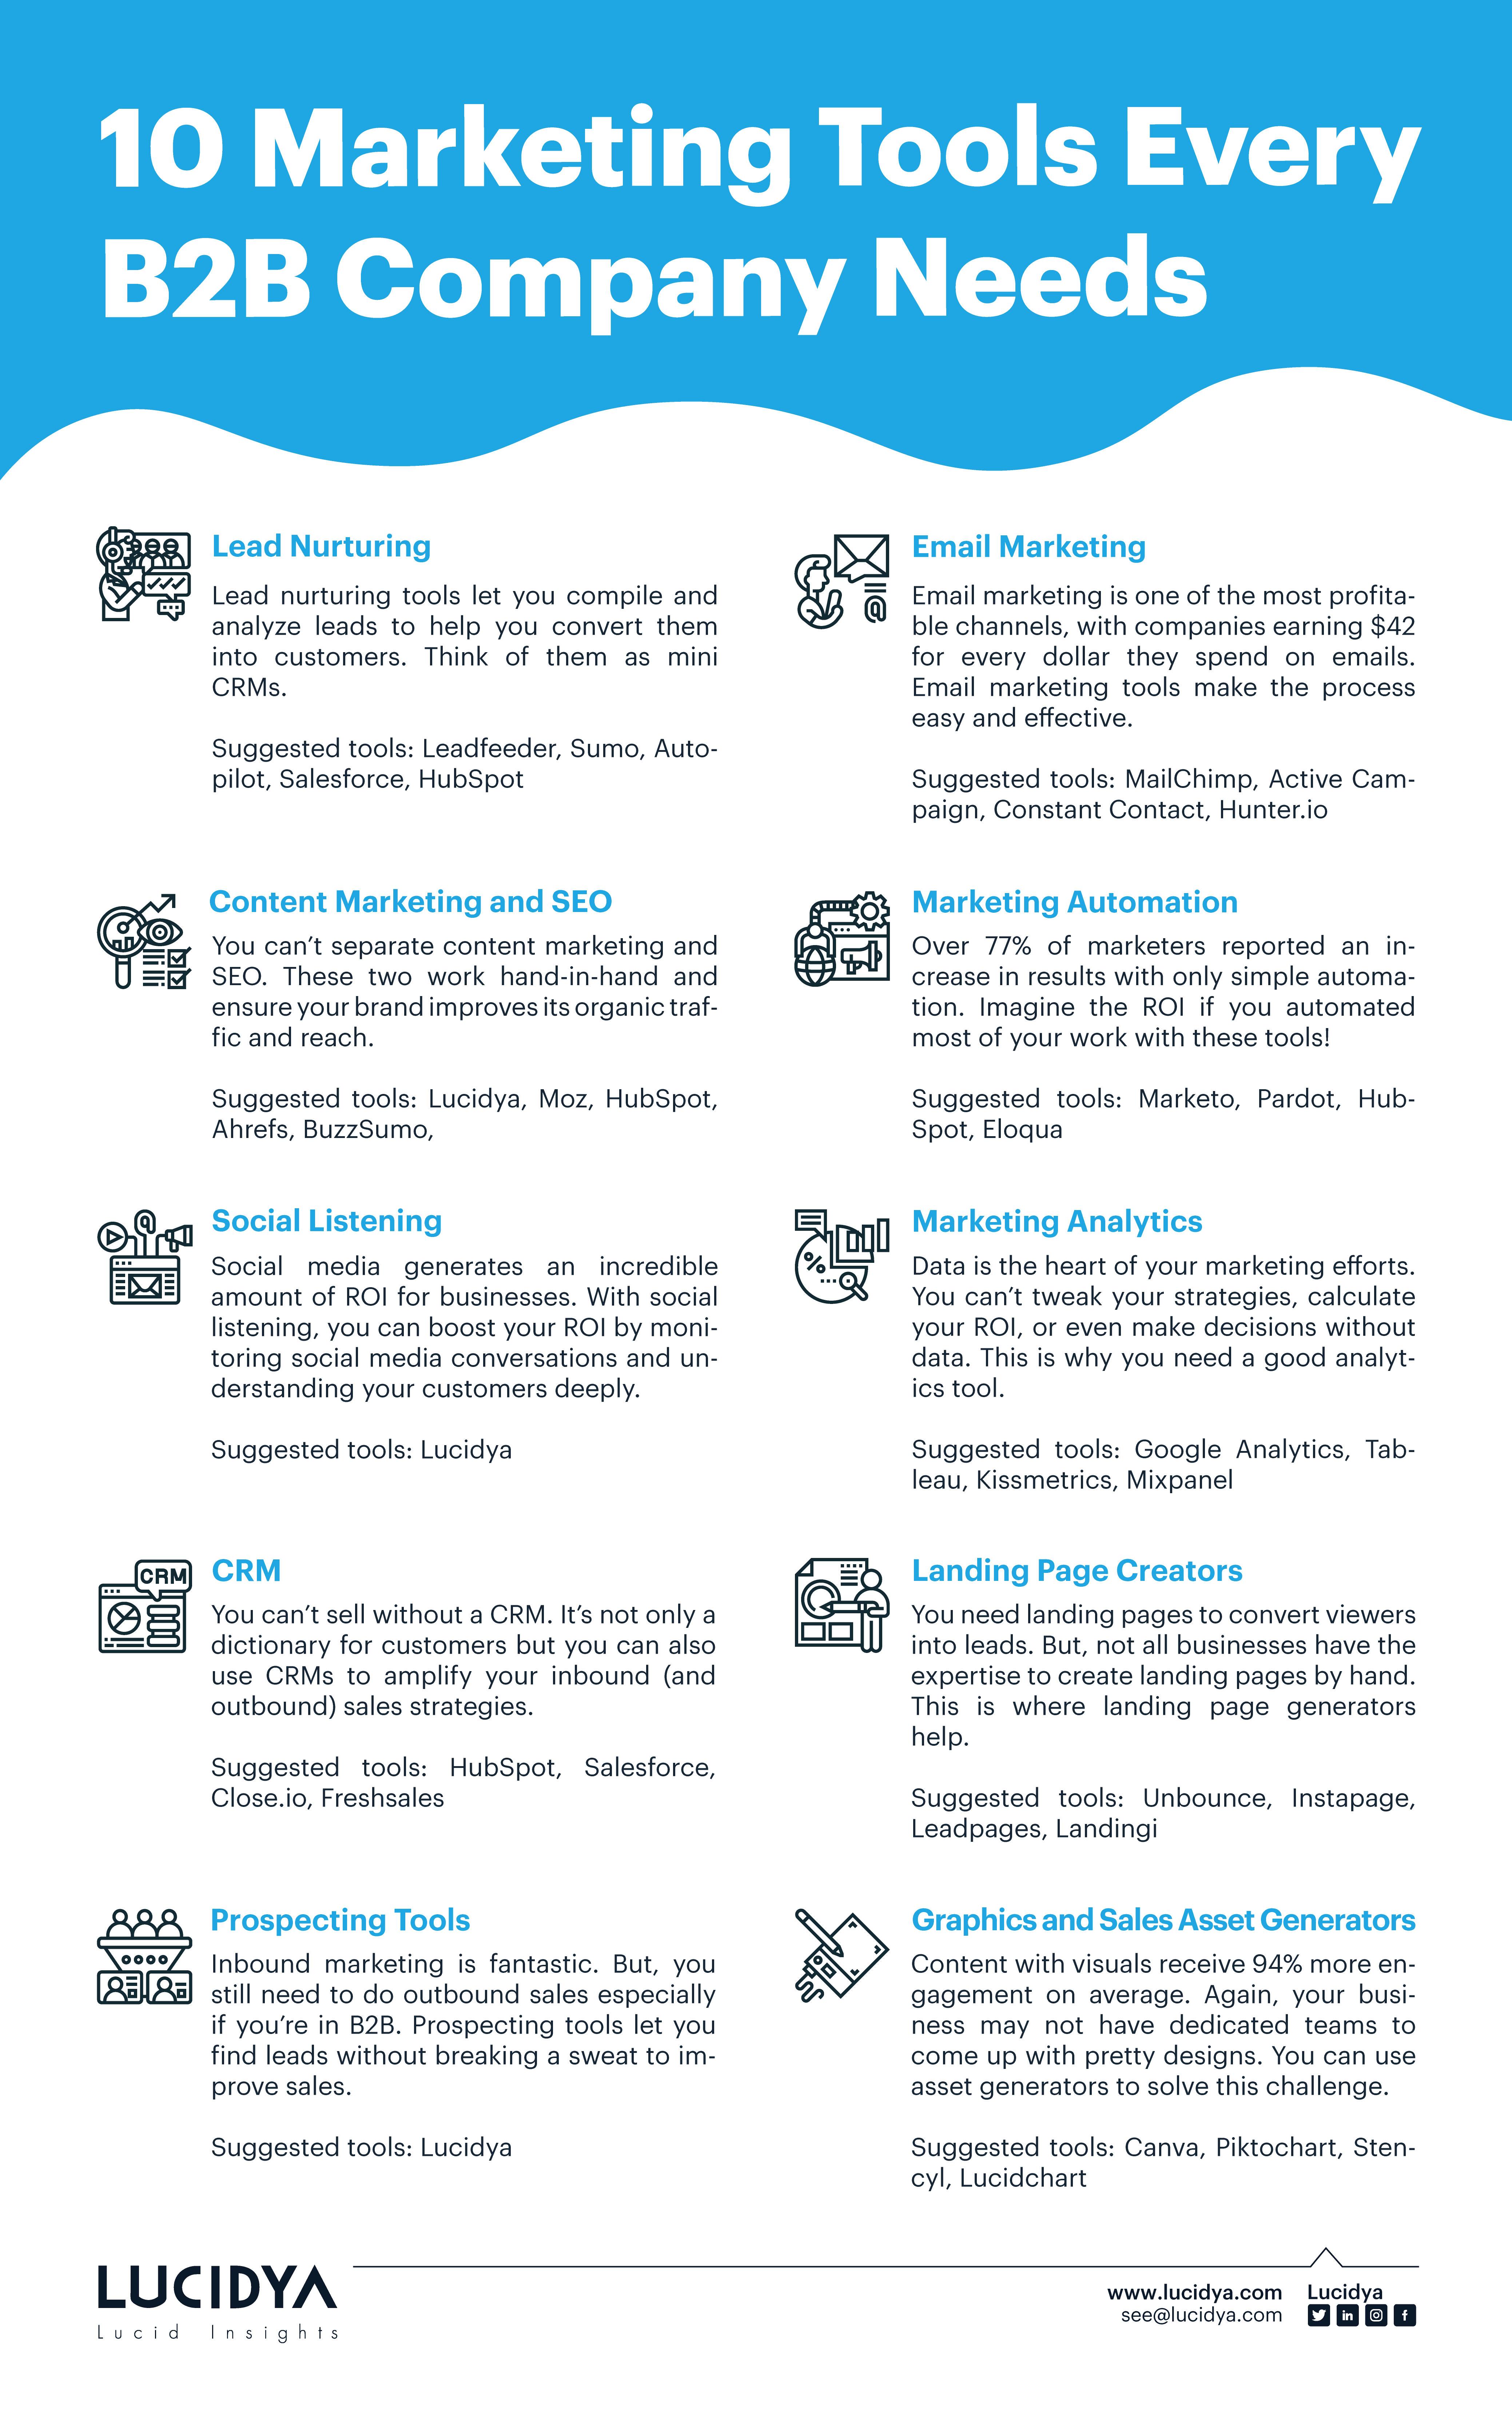 10-Marketing-Tools-Every-B2B-Company-Needs